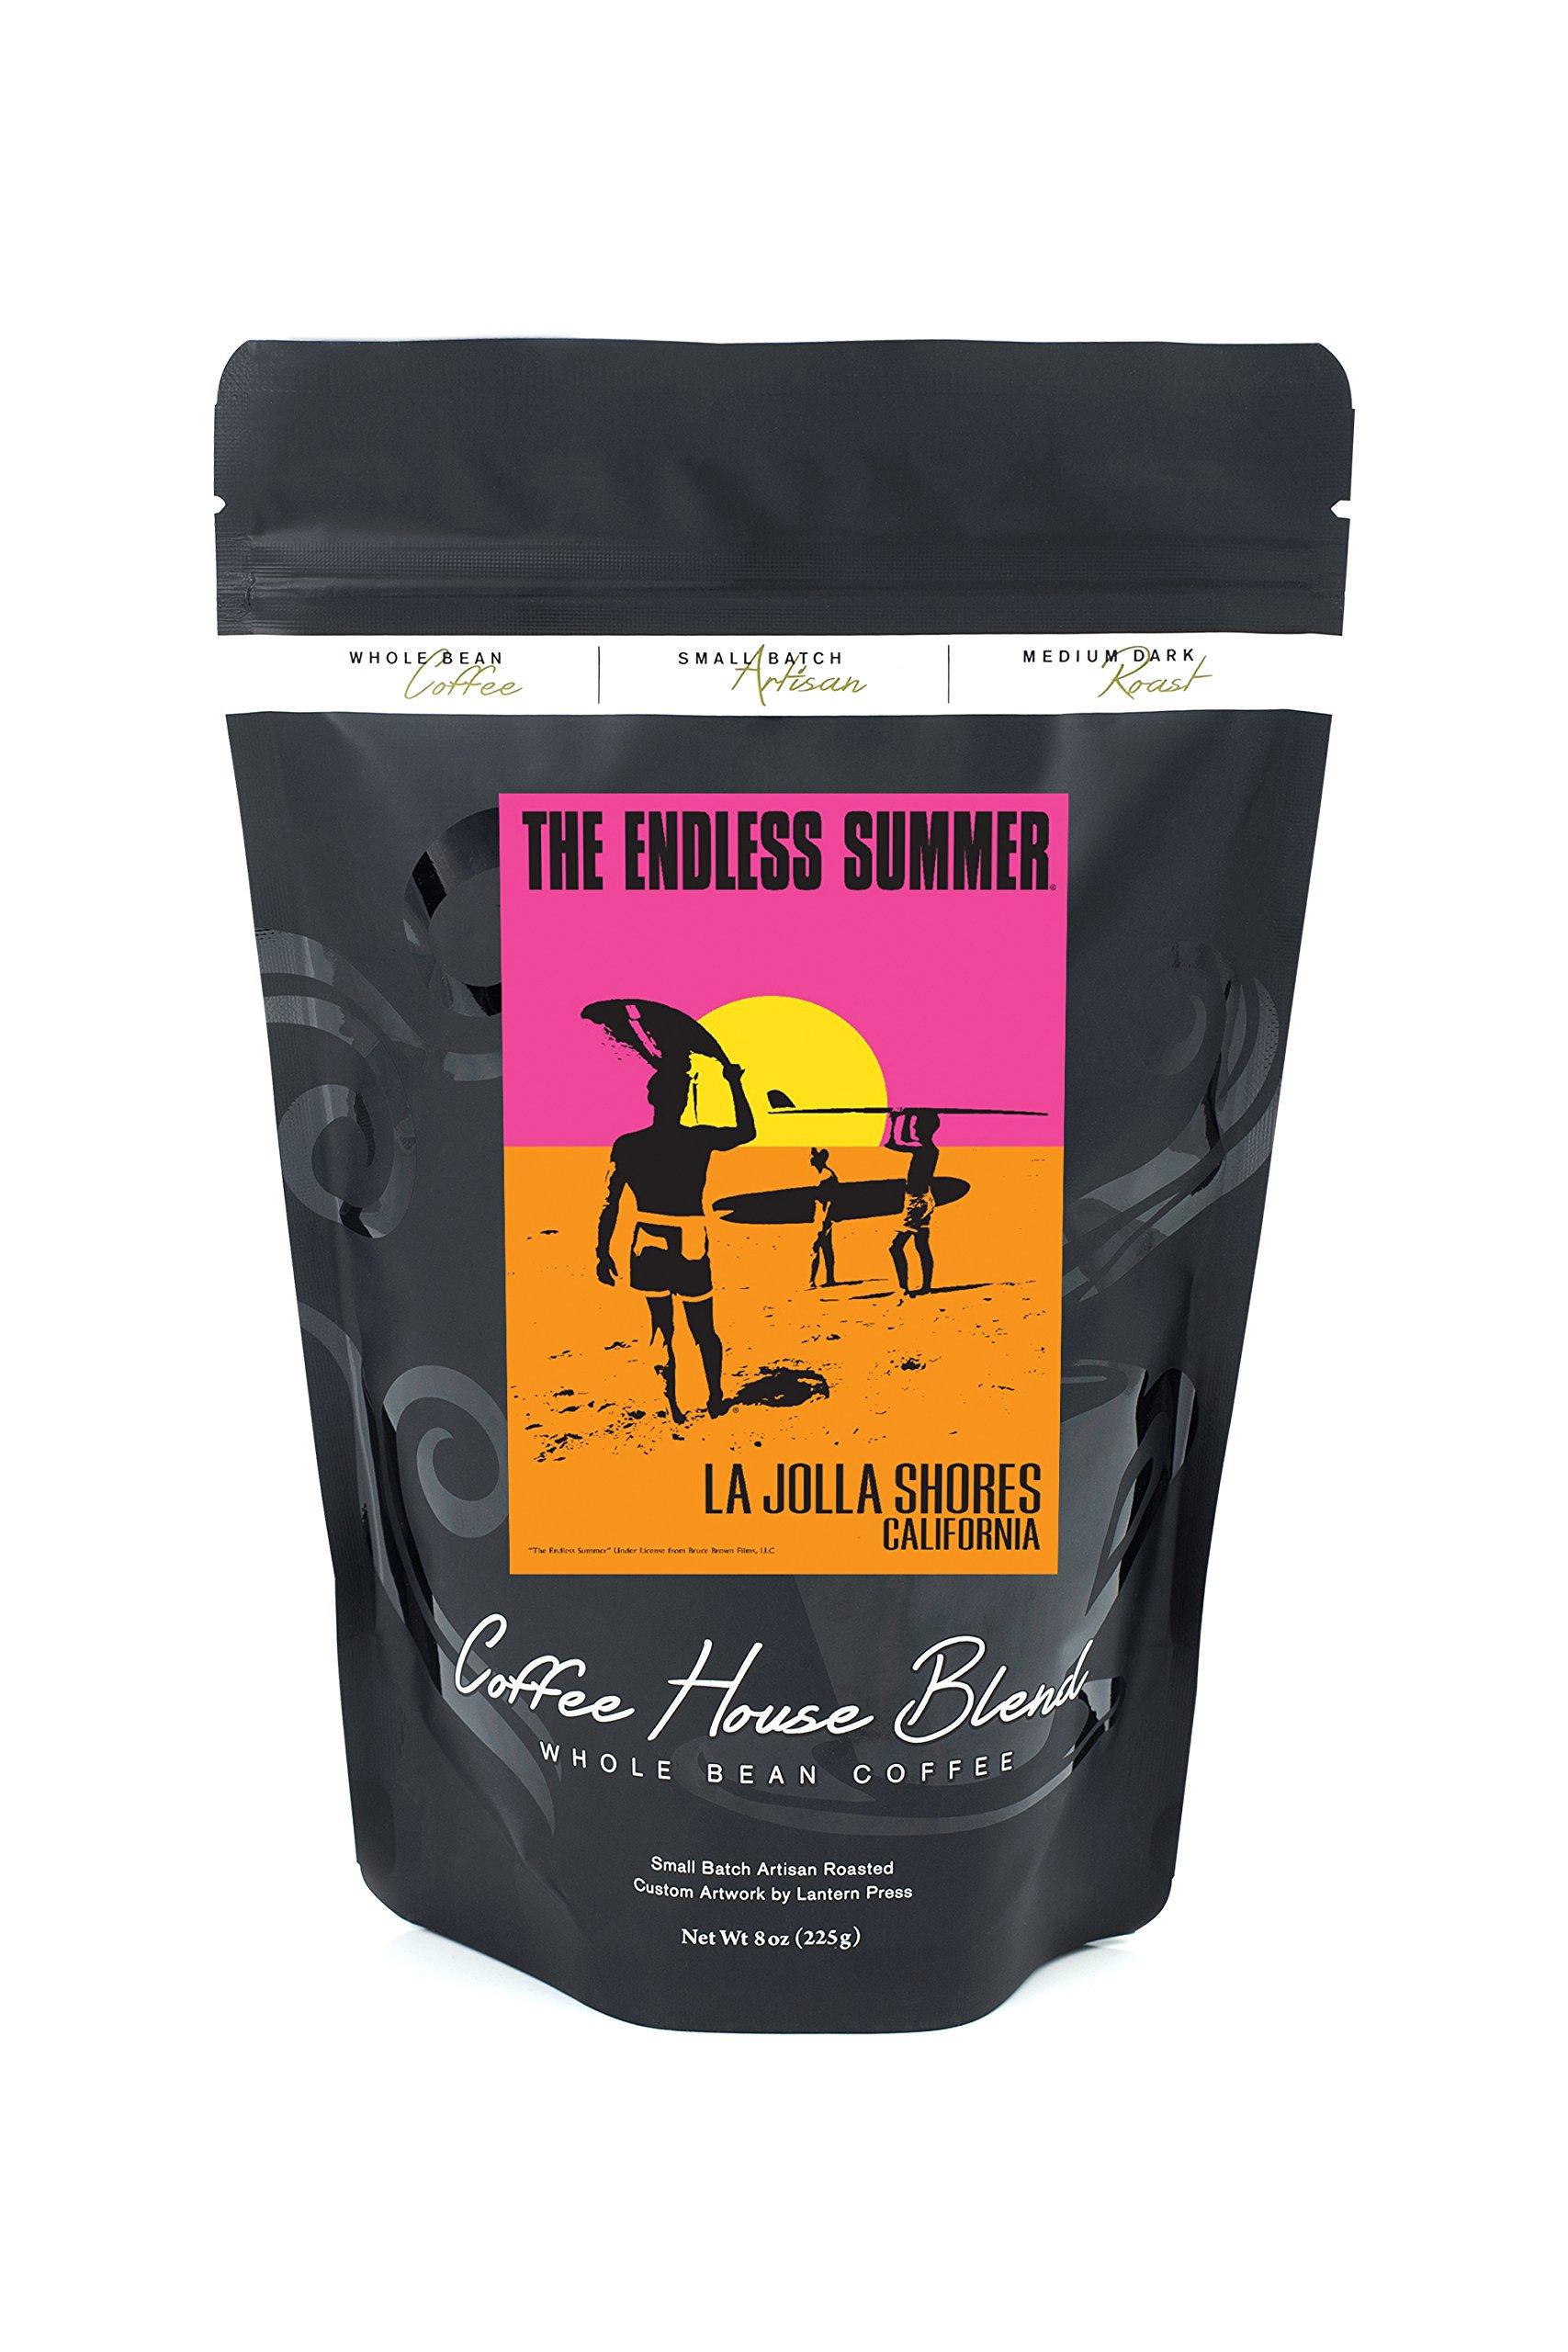 La Jolla Shores, California - The Endless Summer - Original Movie Poster (8oz Whole Bean Small Batch Artisan Coffee - Bold & Strong Medium Dark Roast w/ Artwork)